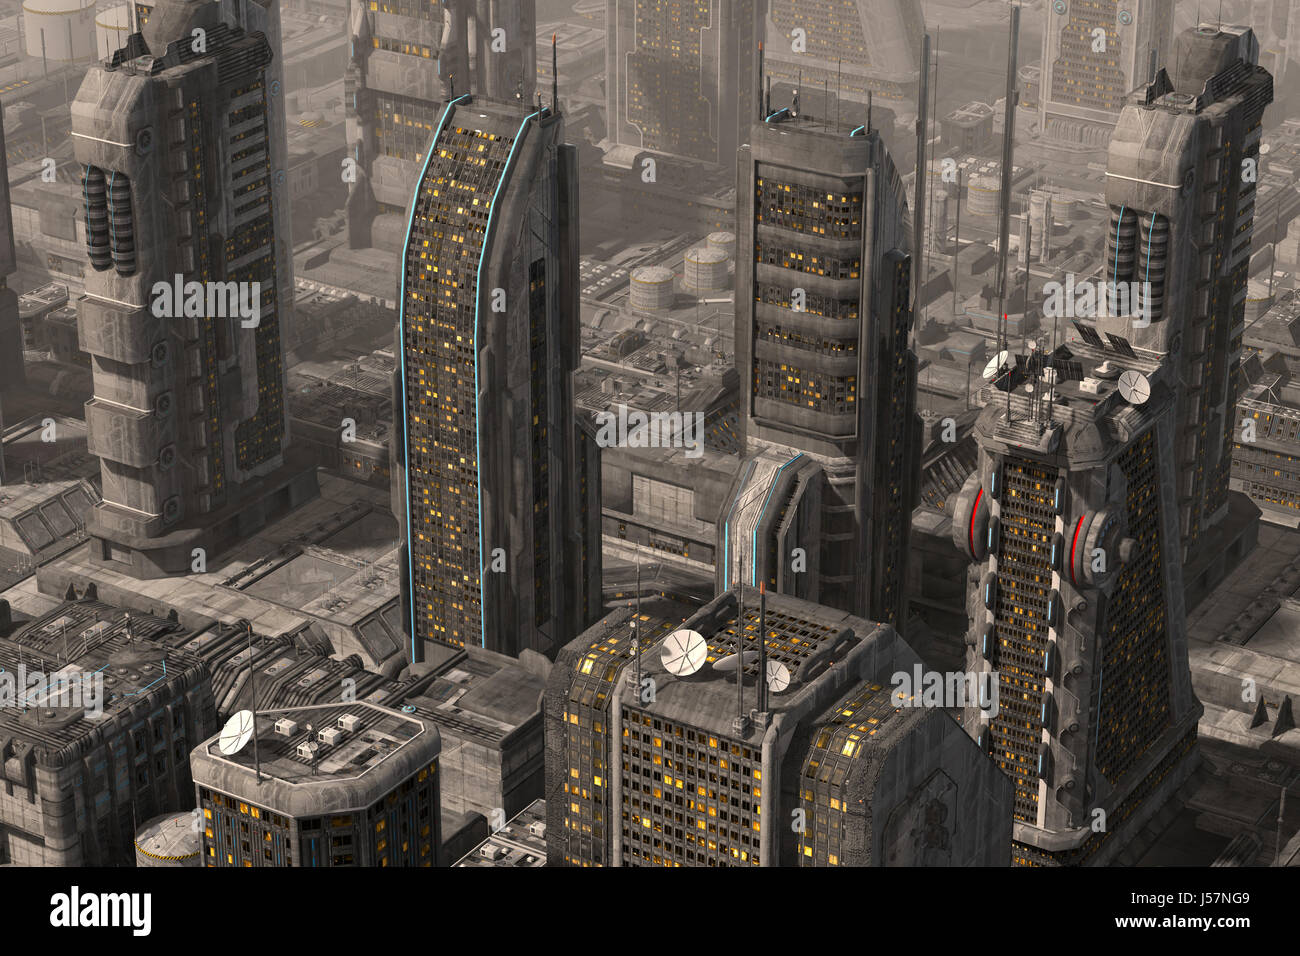 3d Illustration Future City For Futuristic Or Fantasy Backgrounds Stock Photo Alamy